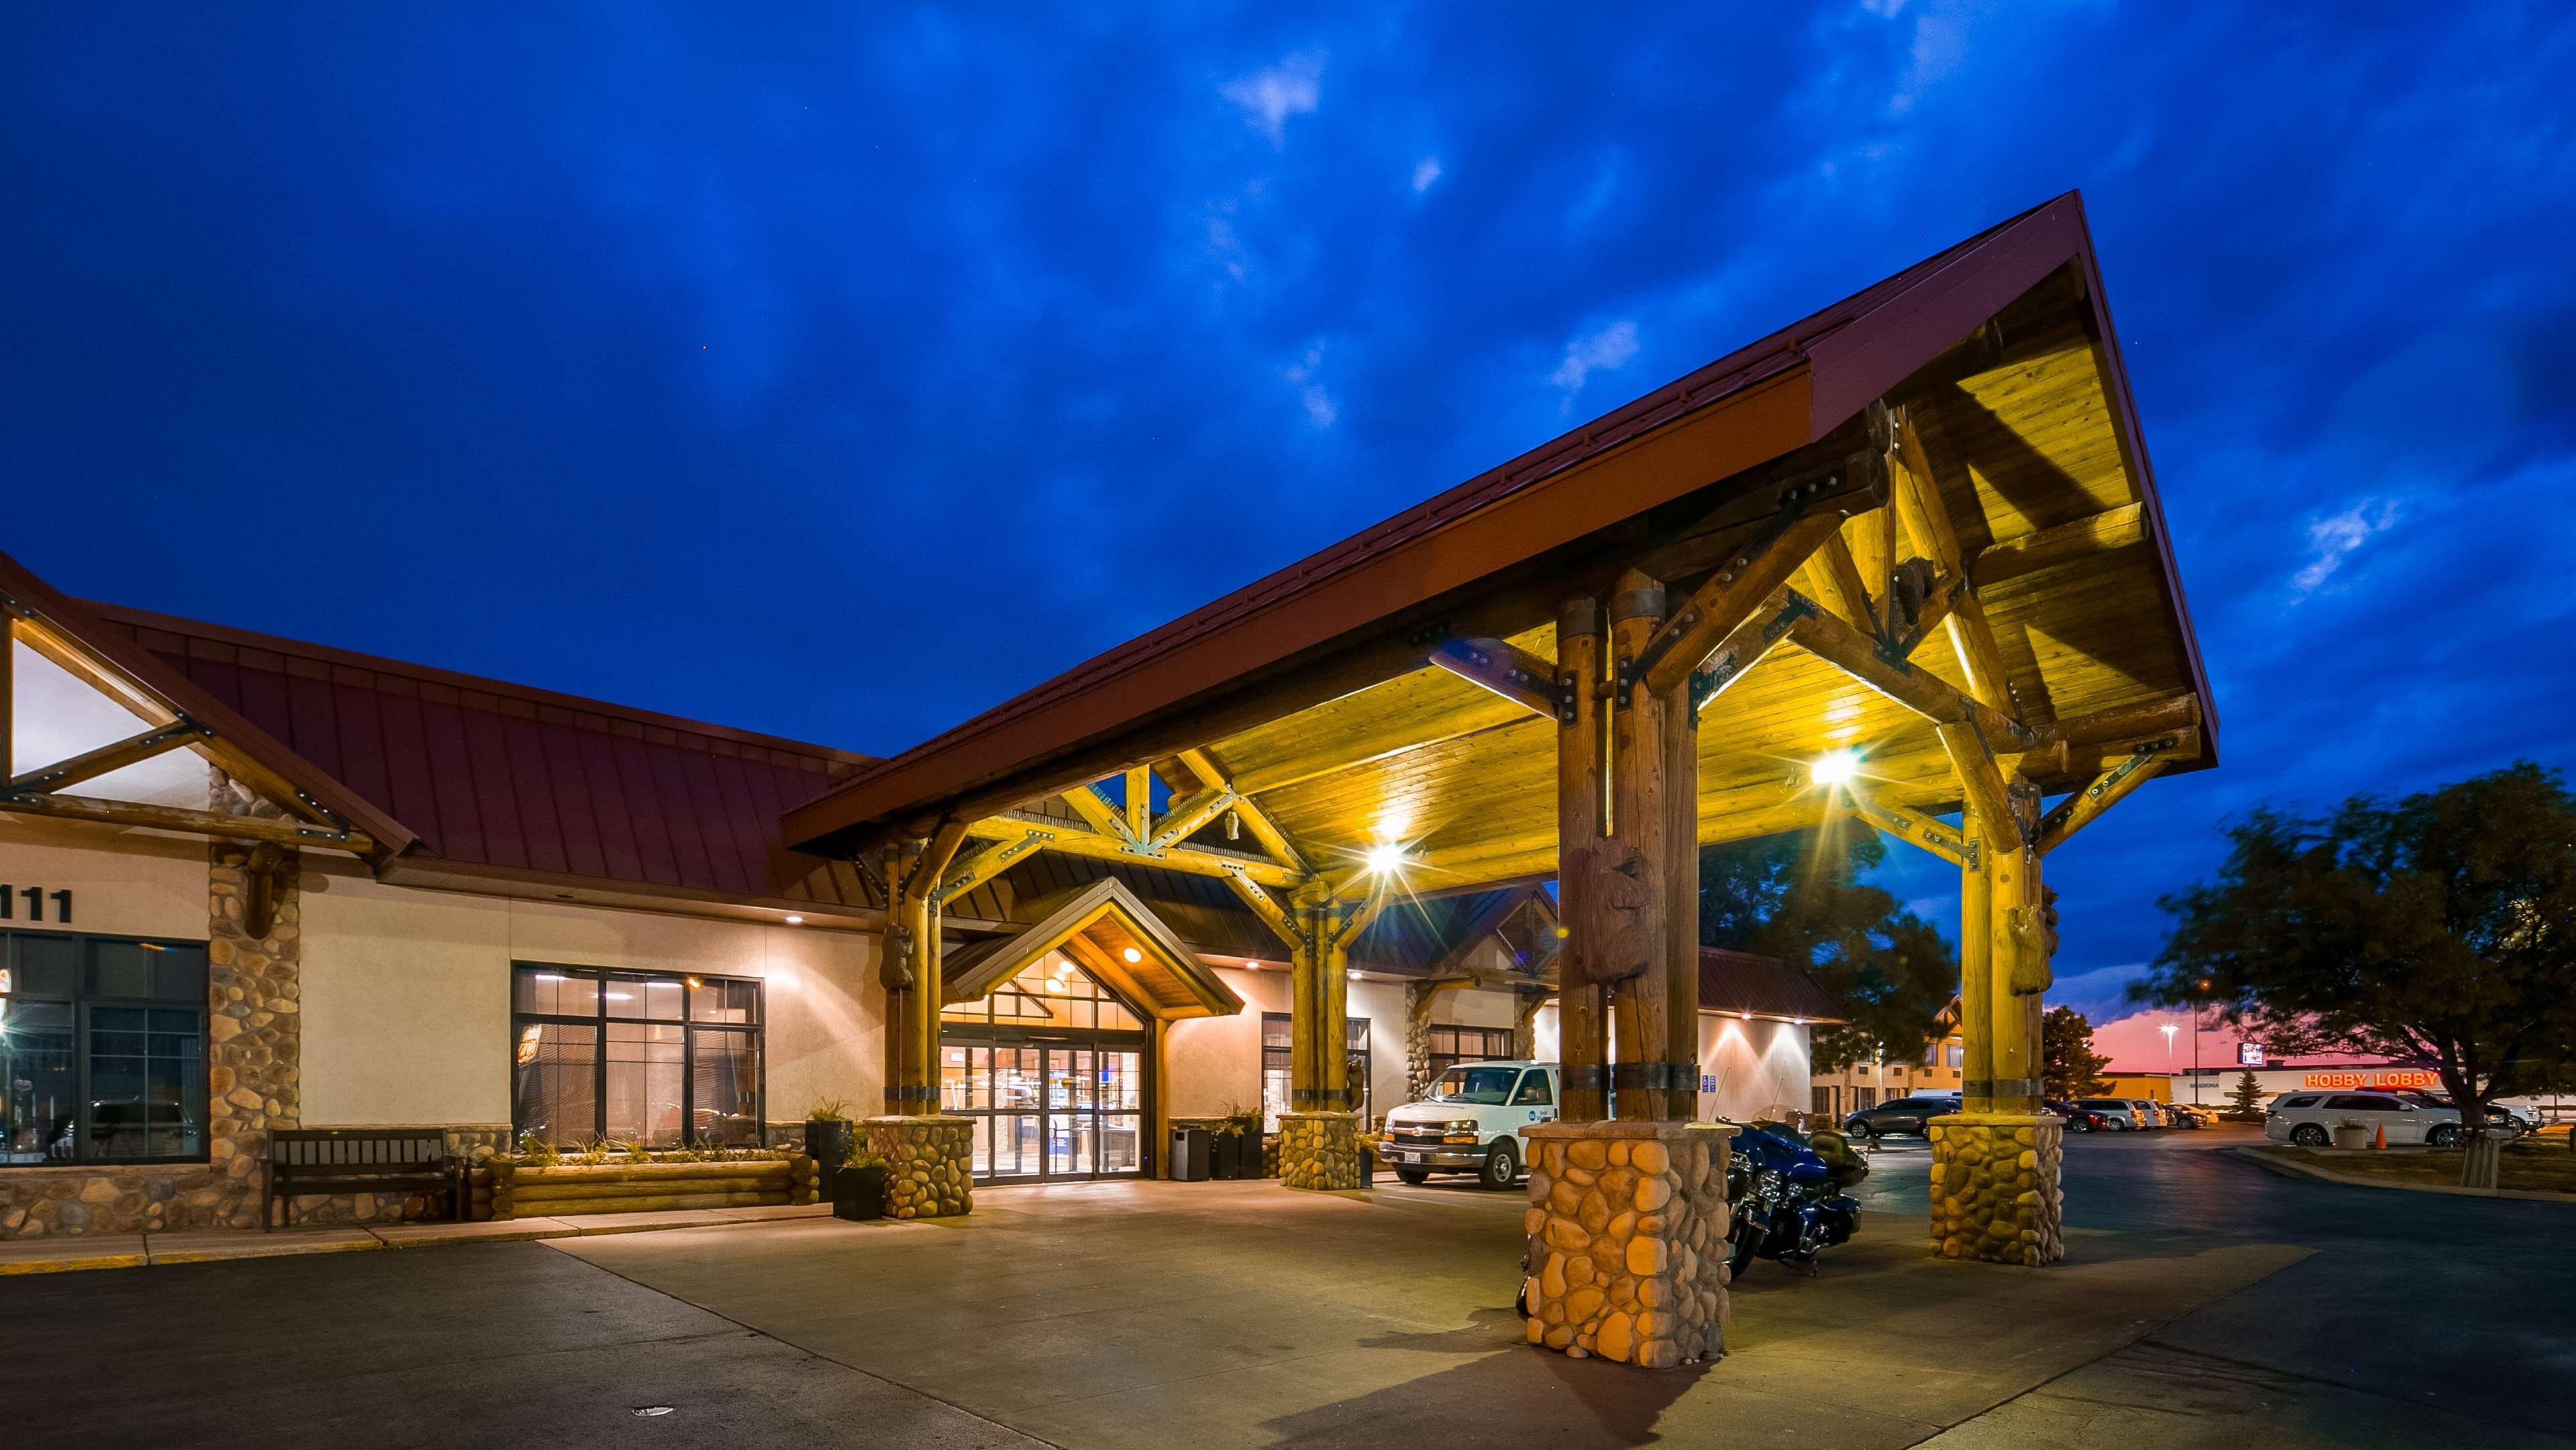 Ramkota Hotel Rapid City Stores